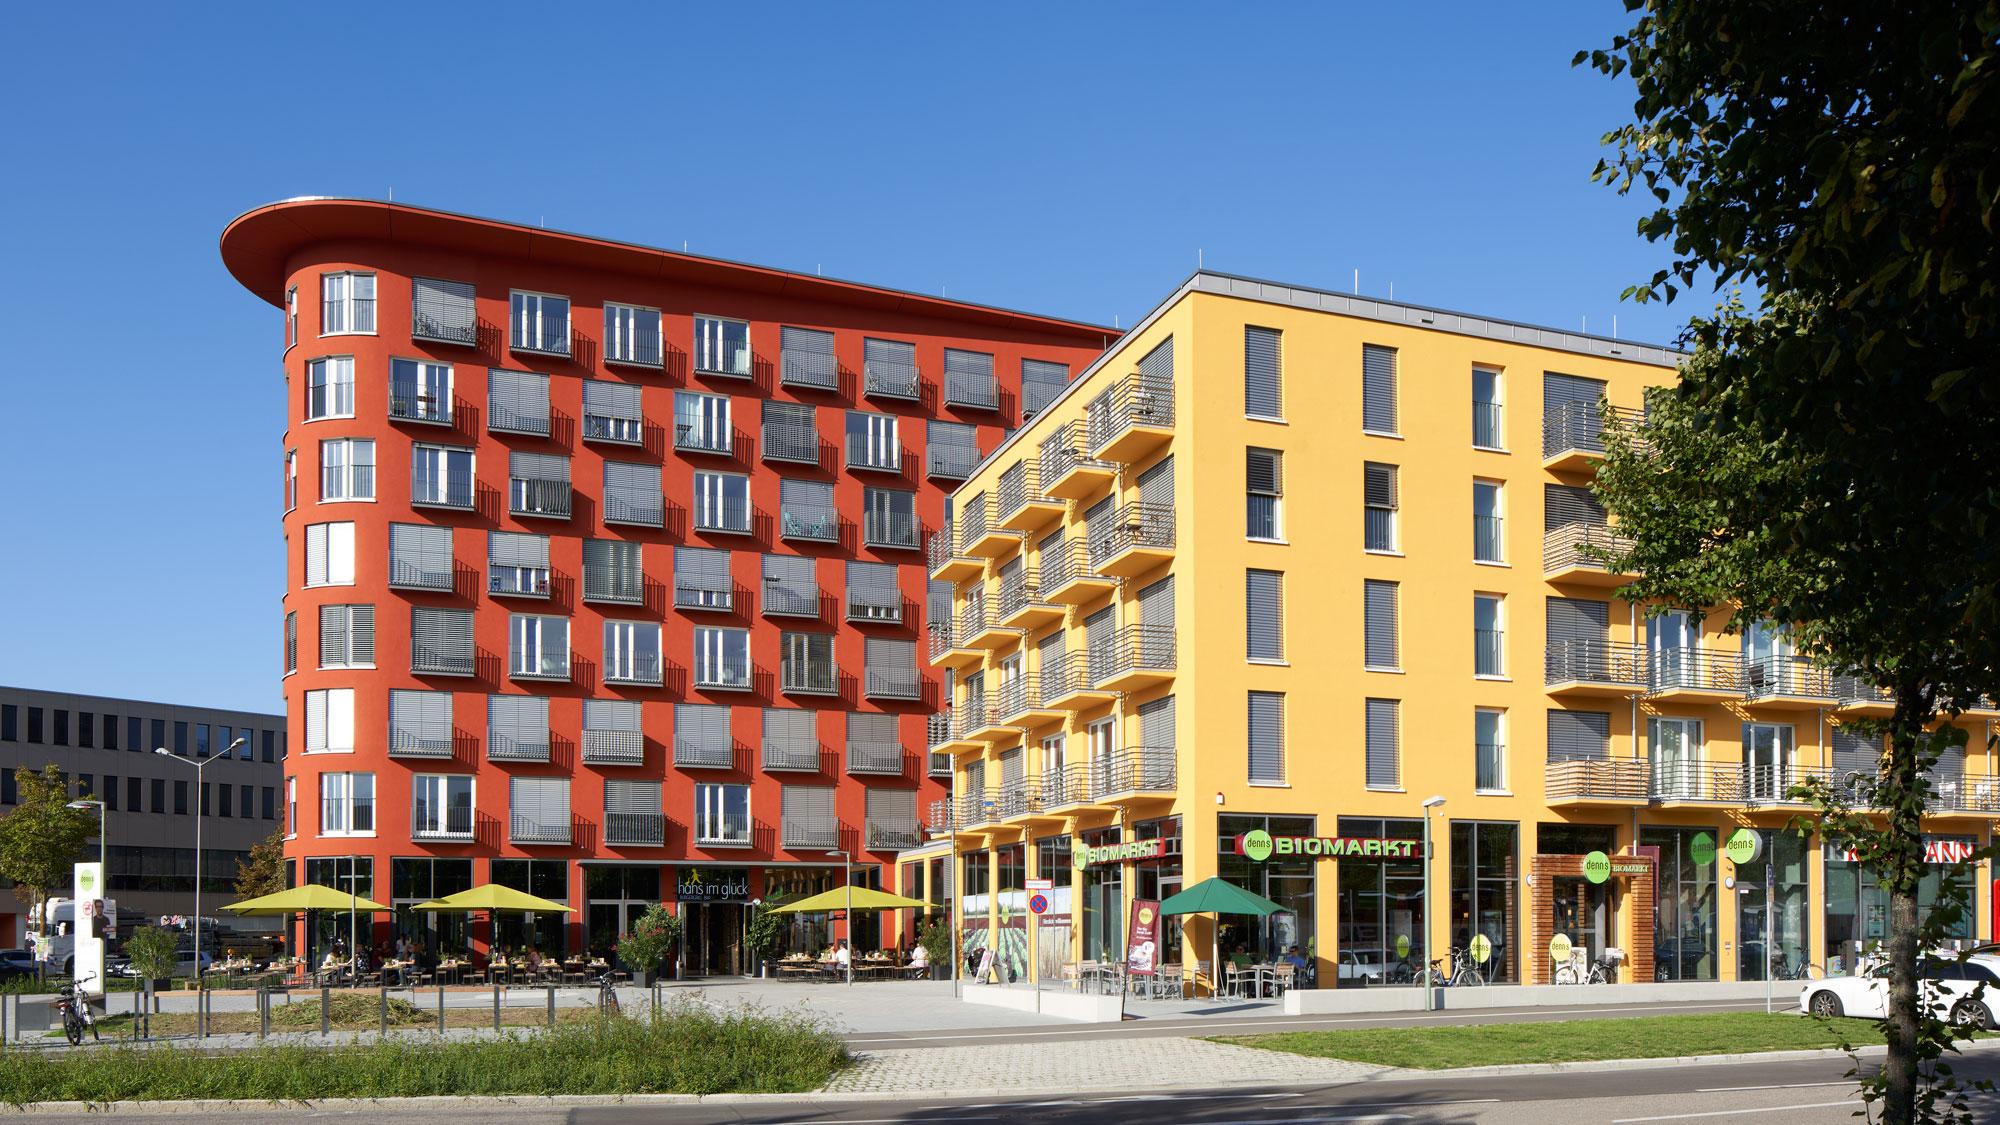 studiosus 5 studentenwohnungen apartments in augsburg. Black Bedroom Furniture Sets. Home Design Ideas